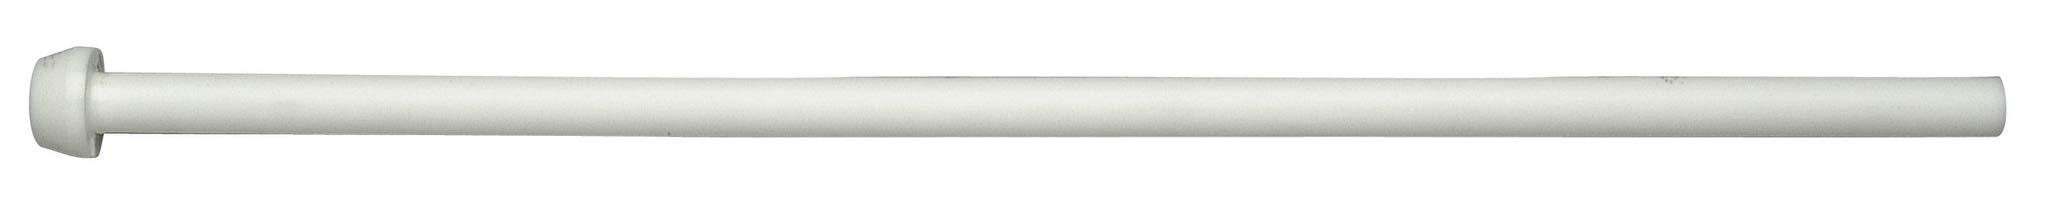 Zurn QCL20X Closet Supply Tube, PEX, 3/8'' OD, 20'' Length, Plastic (Pack of 100)